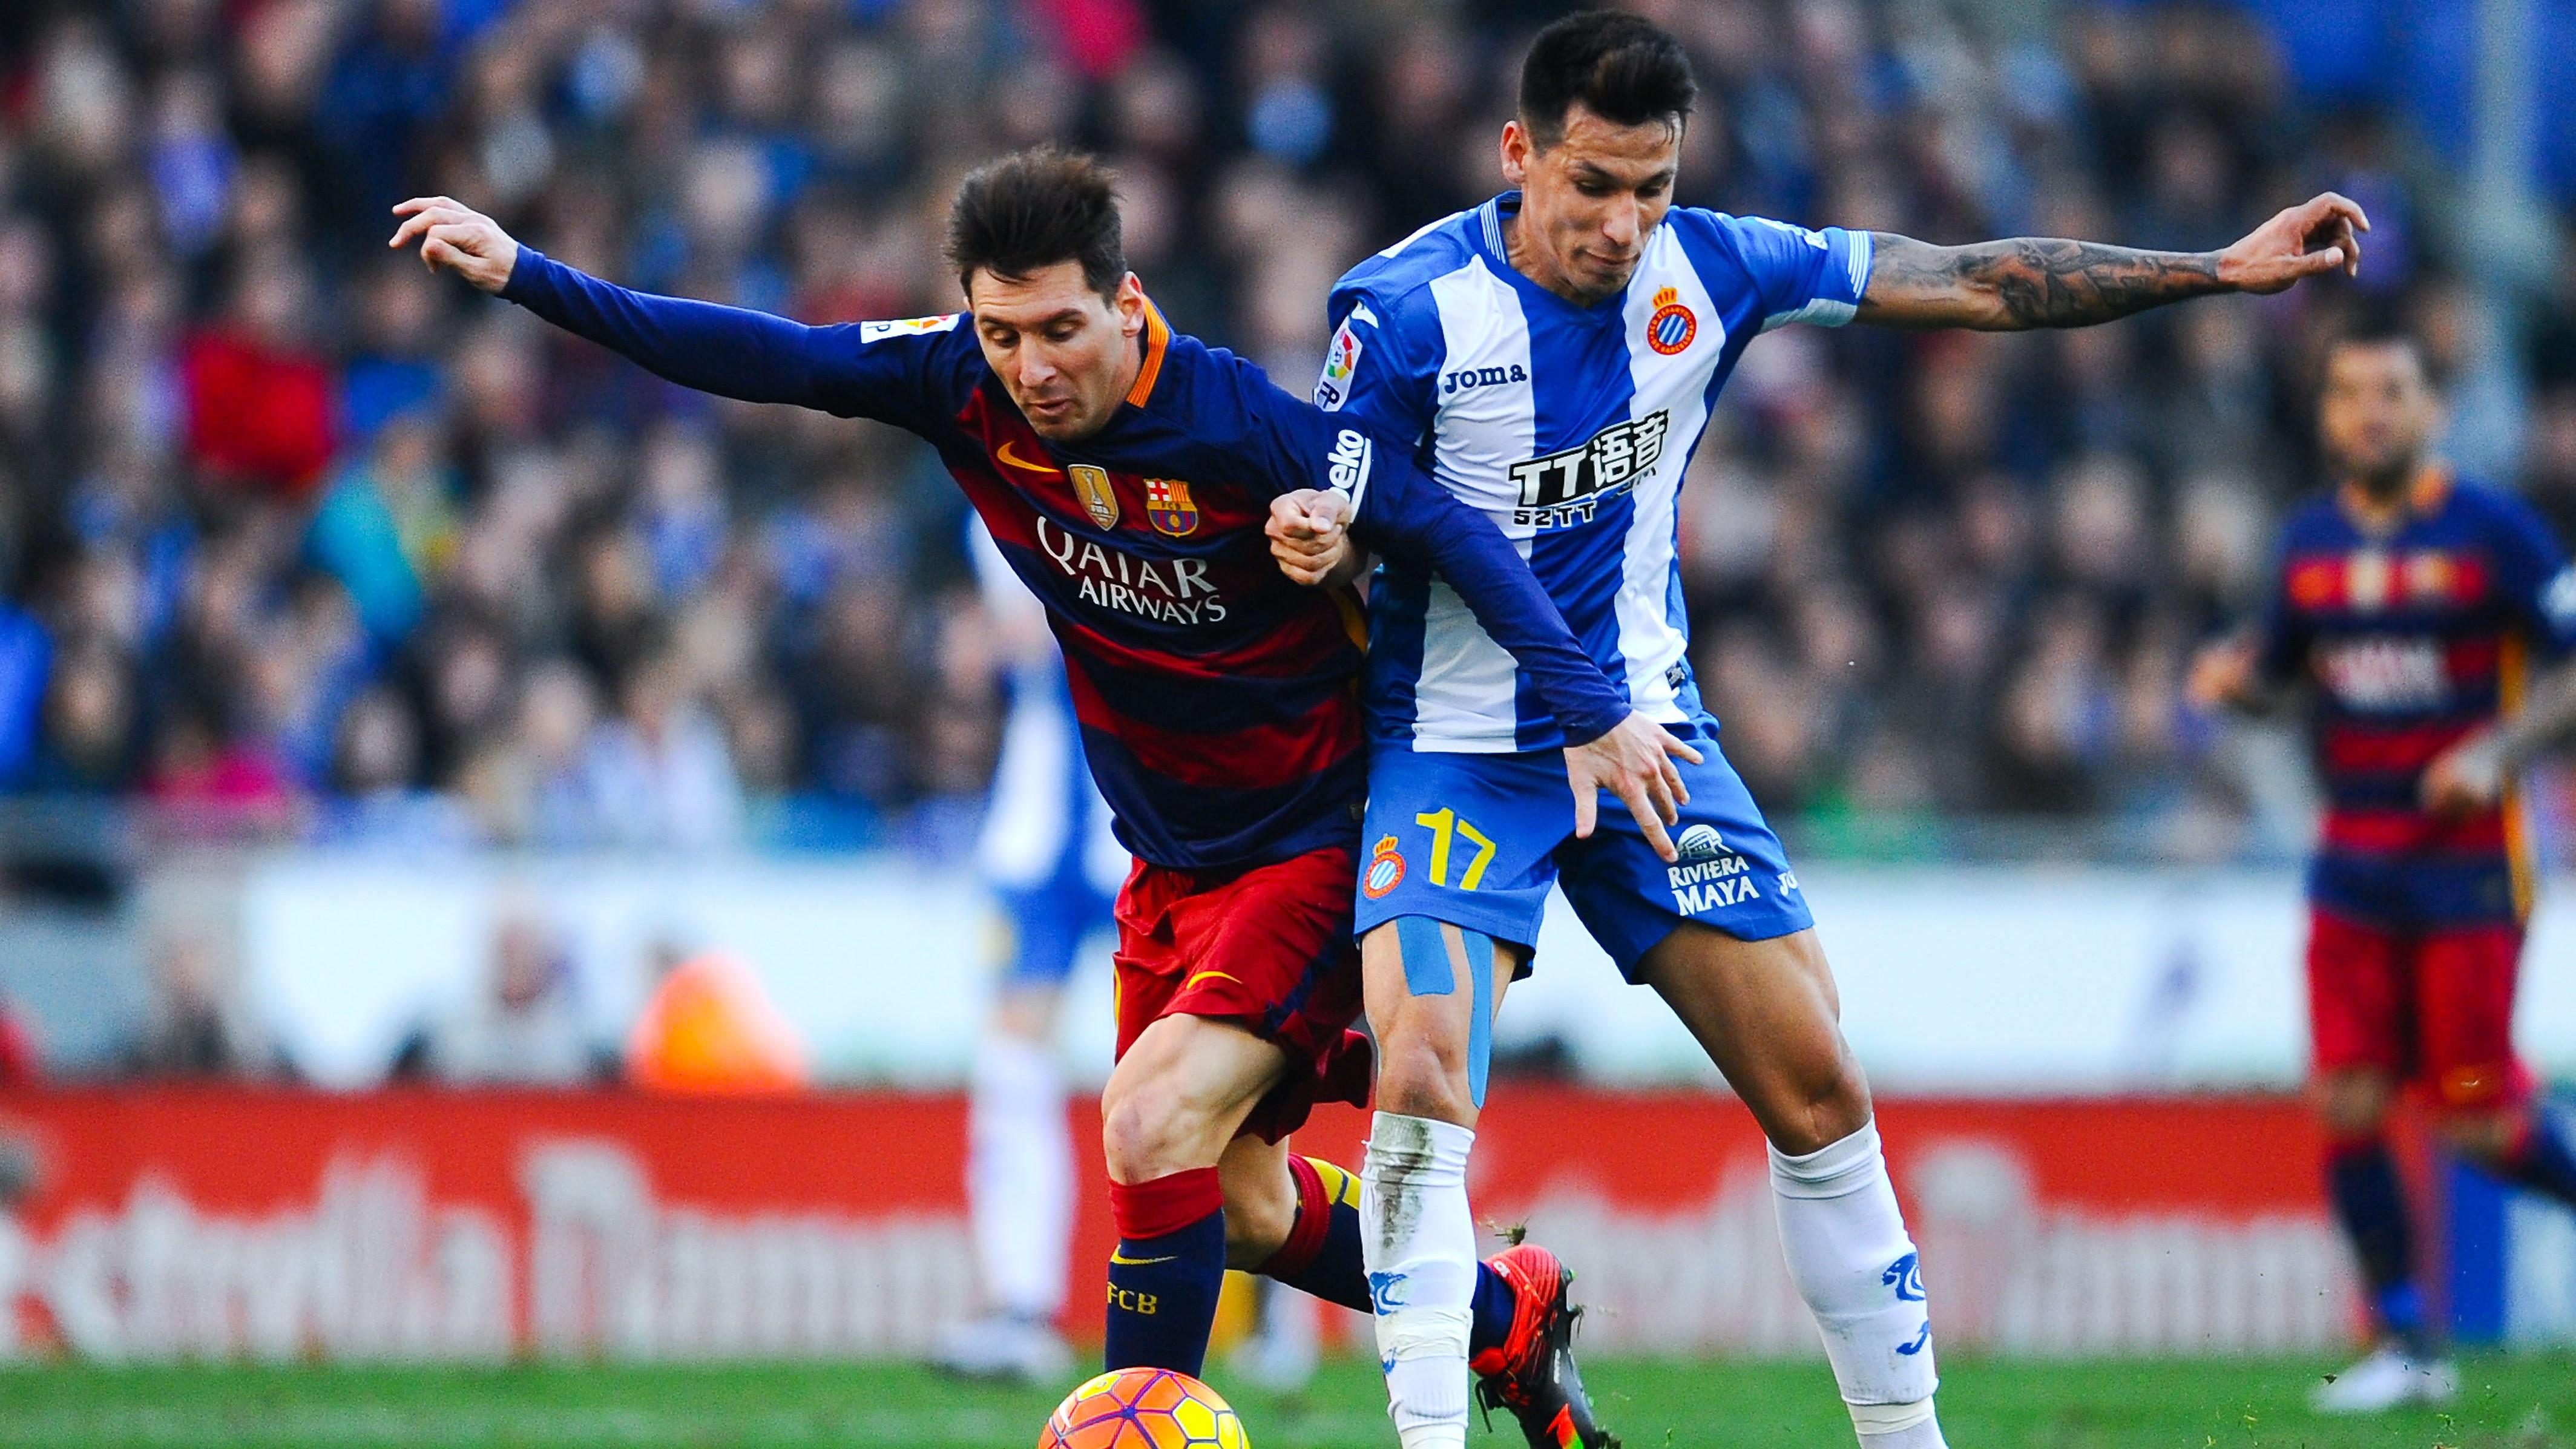 Barcelona-Espanyol: How to Watch Free Live Stream Online